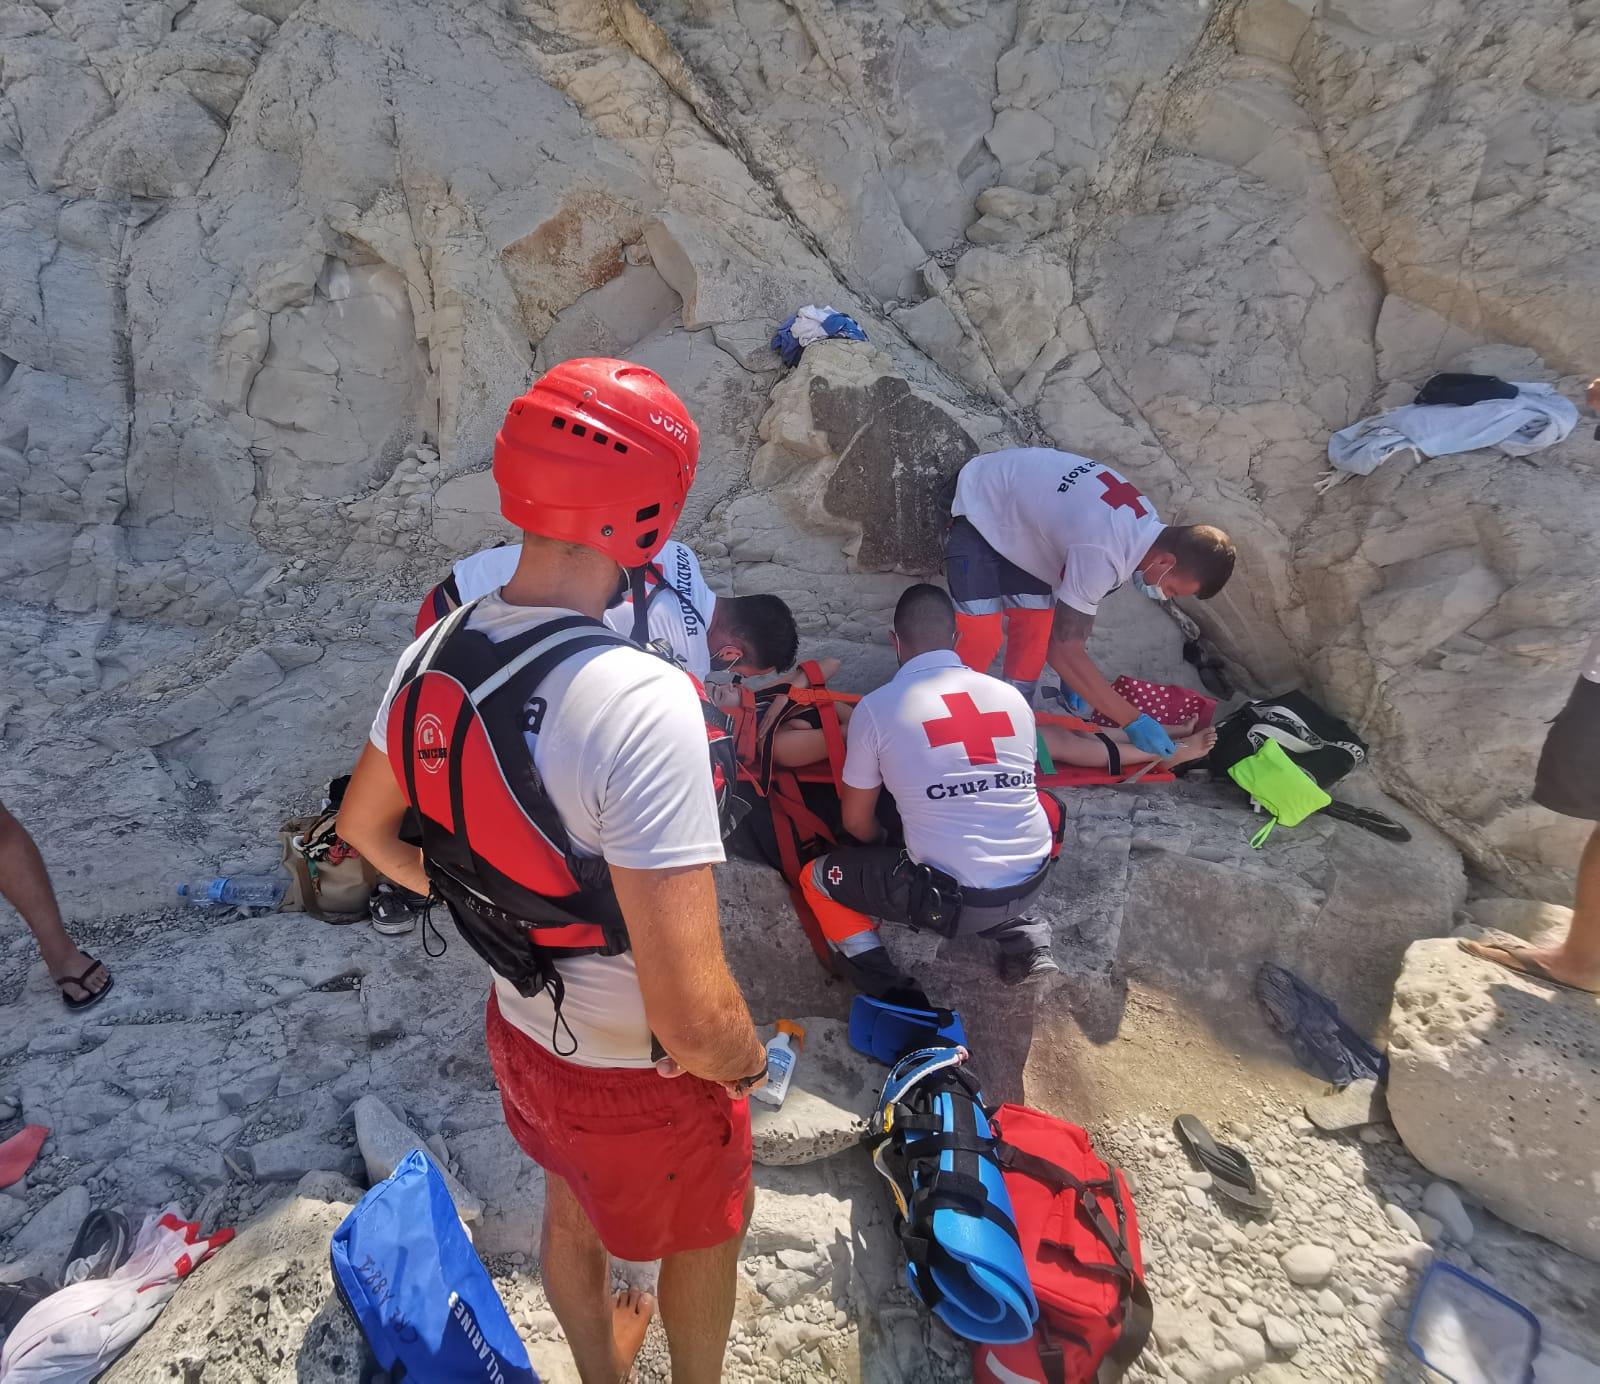 Cruz Roja atiende a la joven herida en una cala de Xàbia